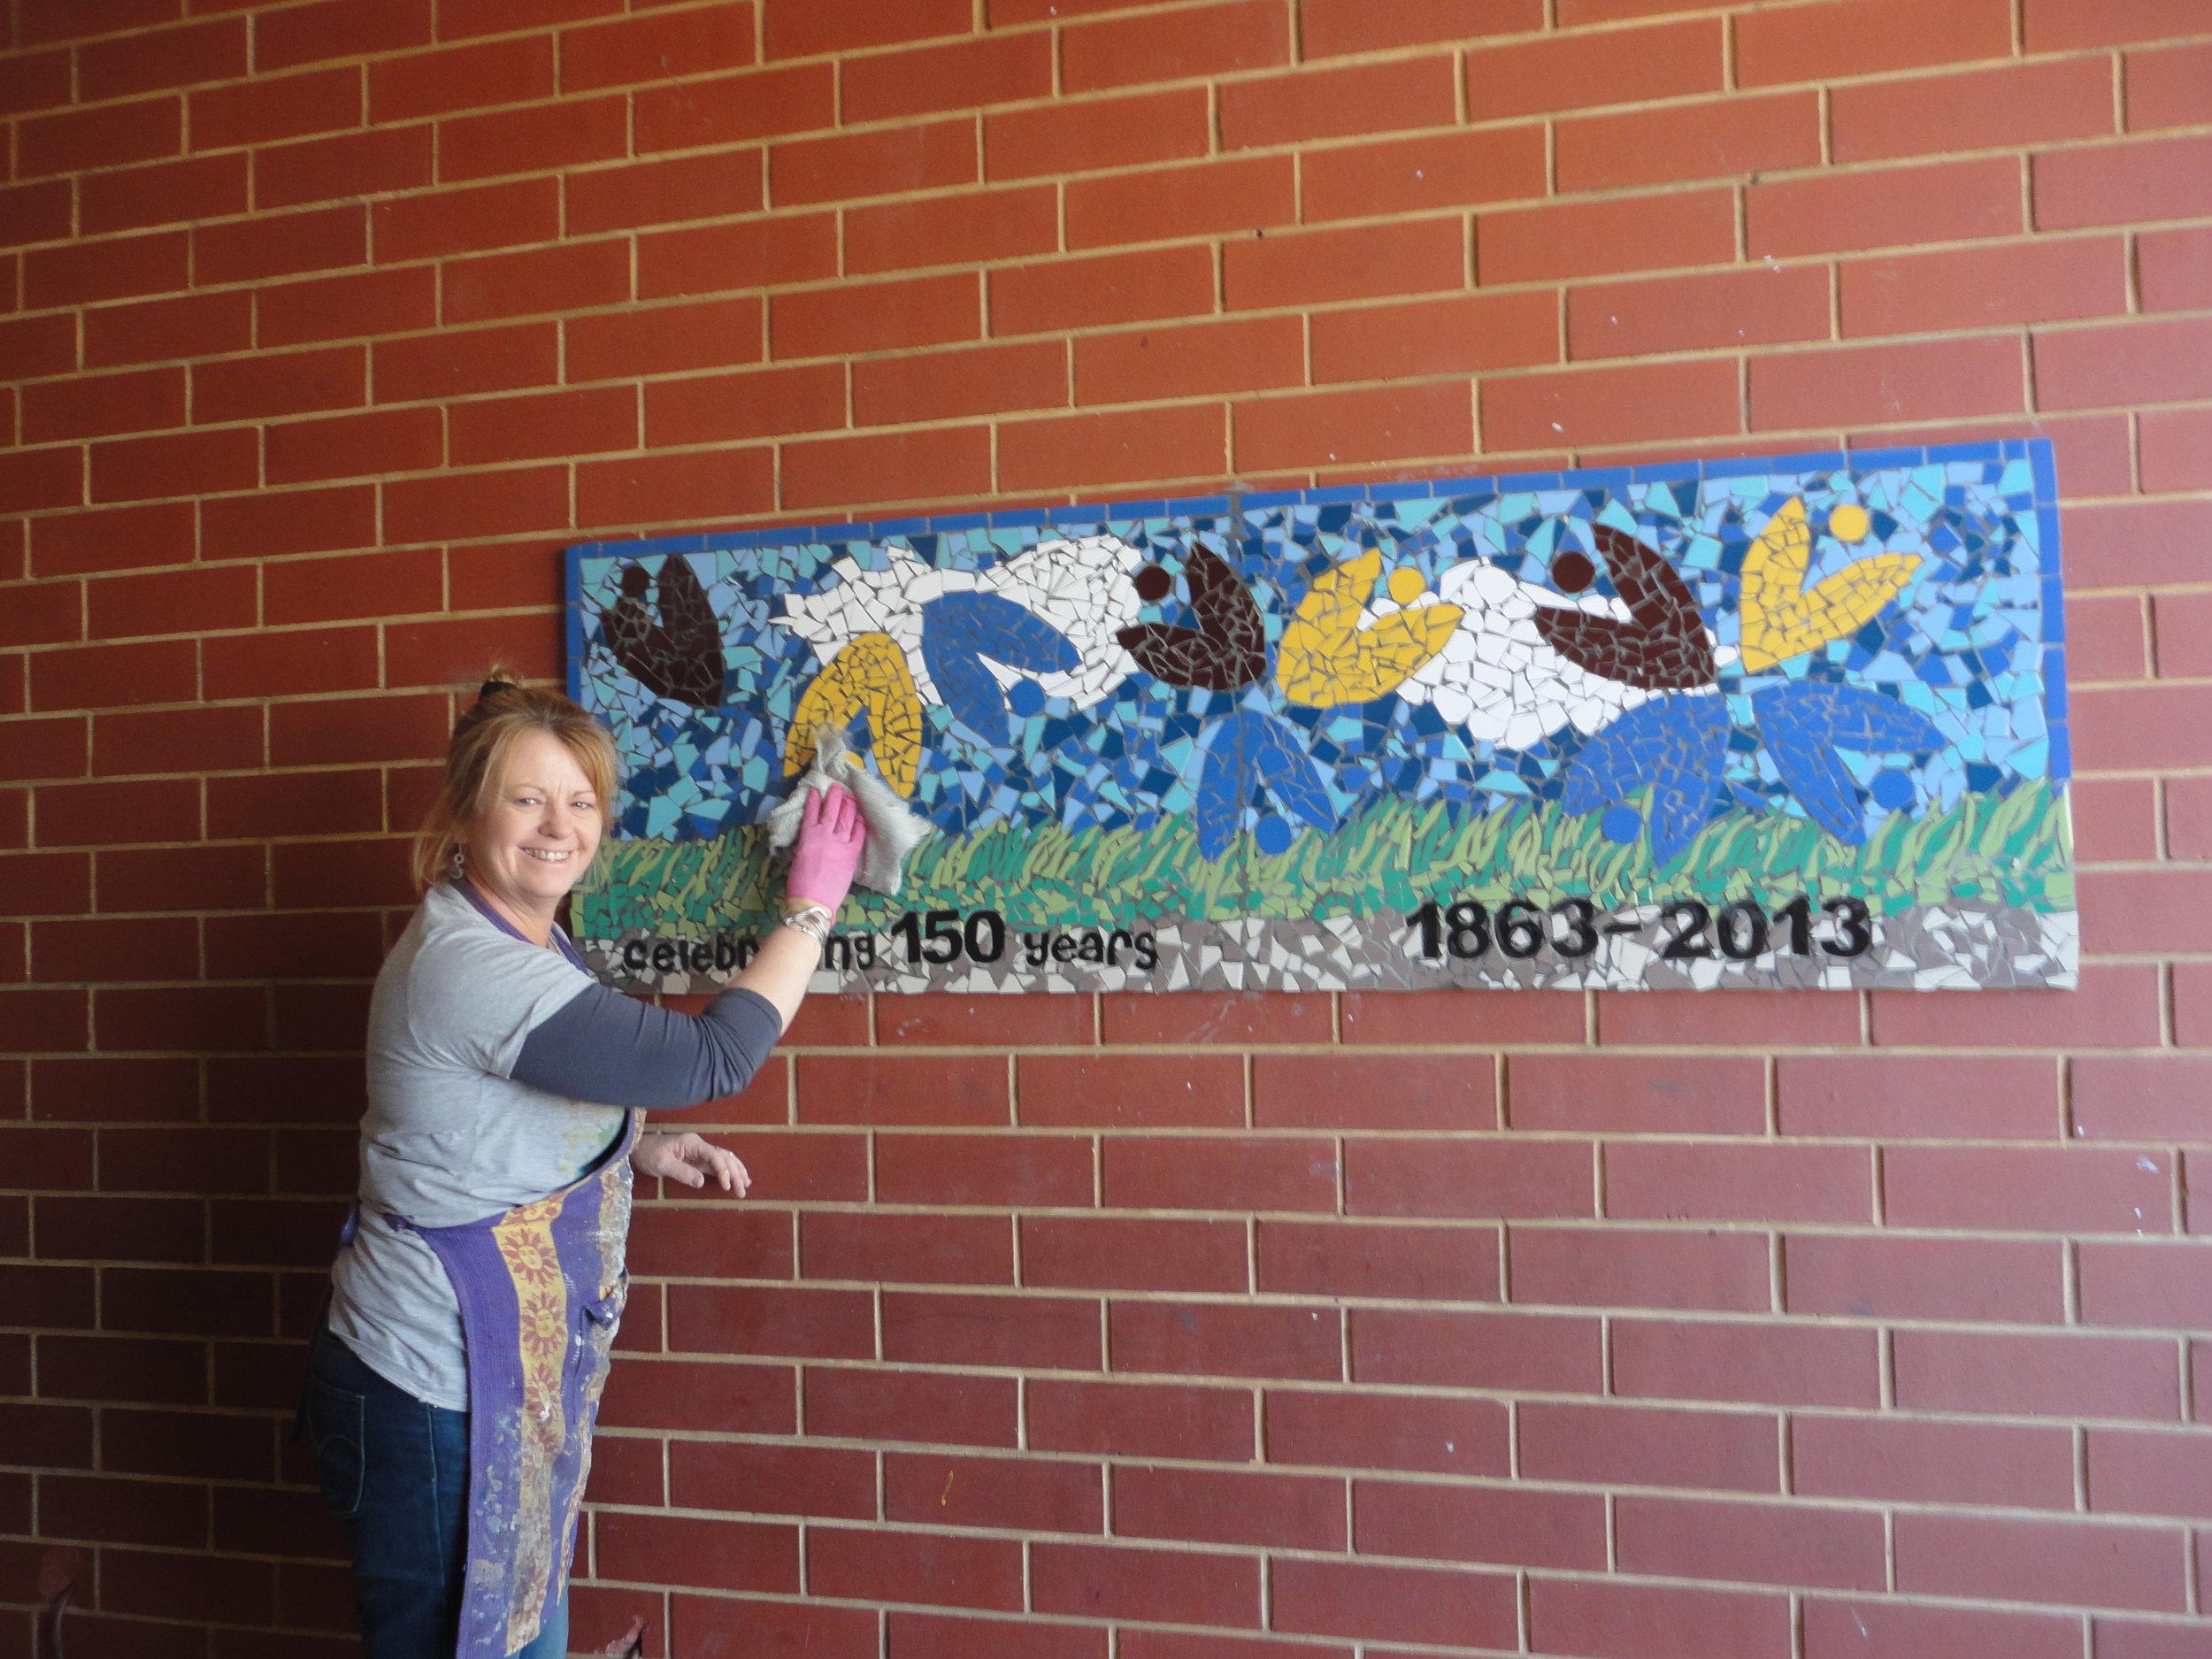 St. Josephs Primary School Commemorative Mural